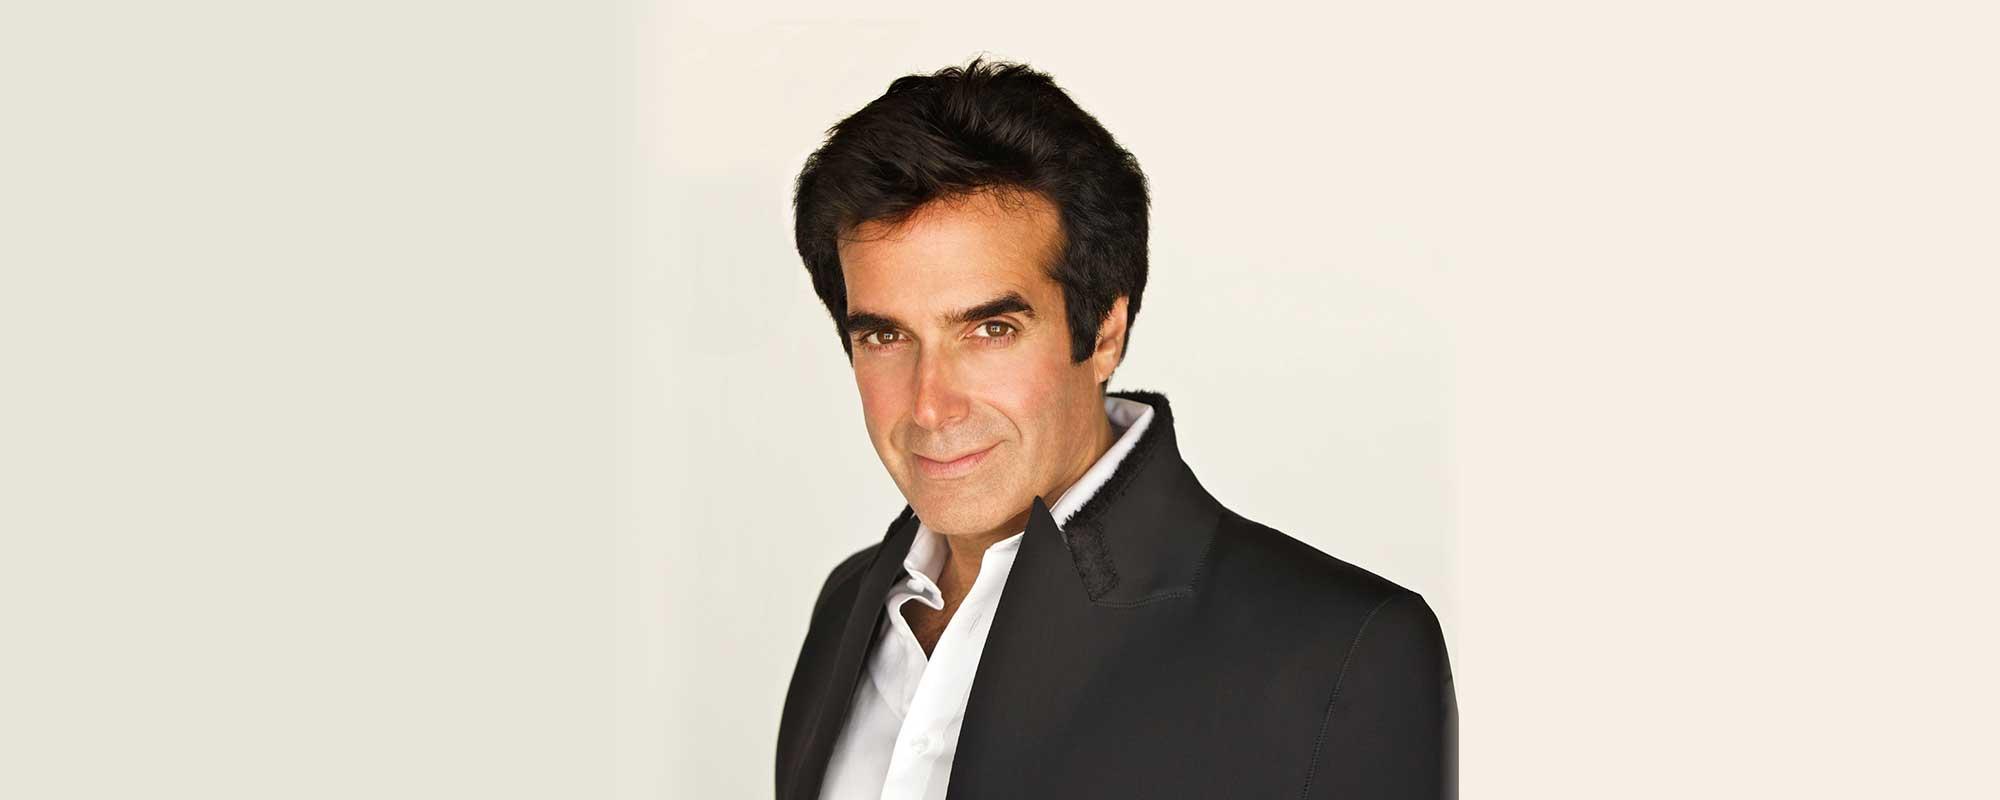 David Copperfield show